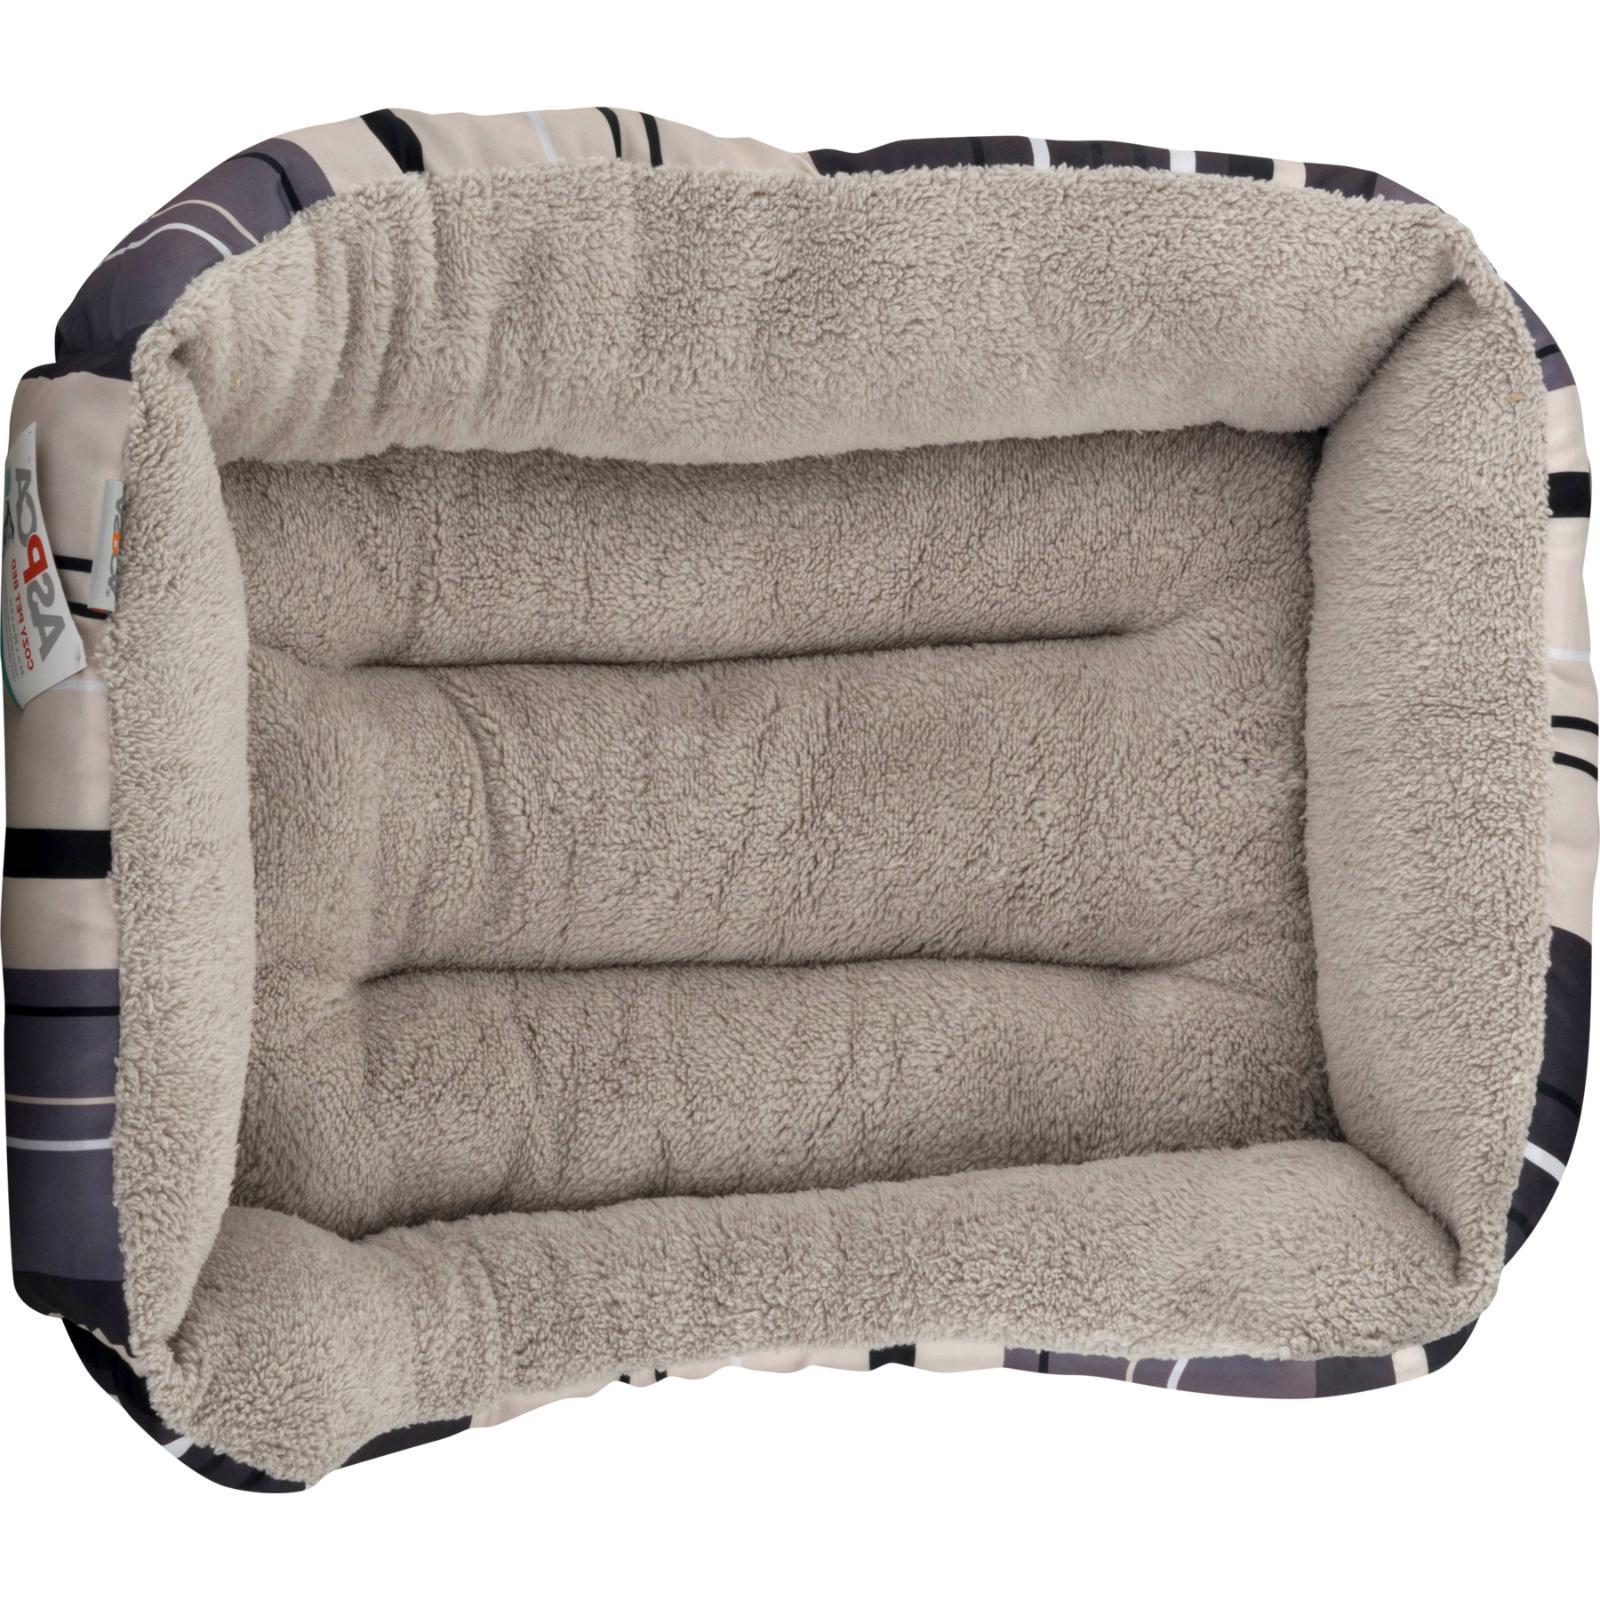 "ASPCA Striped Cuddler & Pet Medium, 20""x20""x8"", Gray"